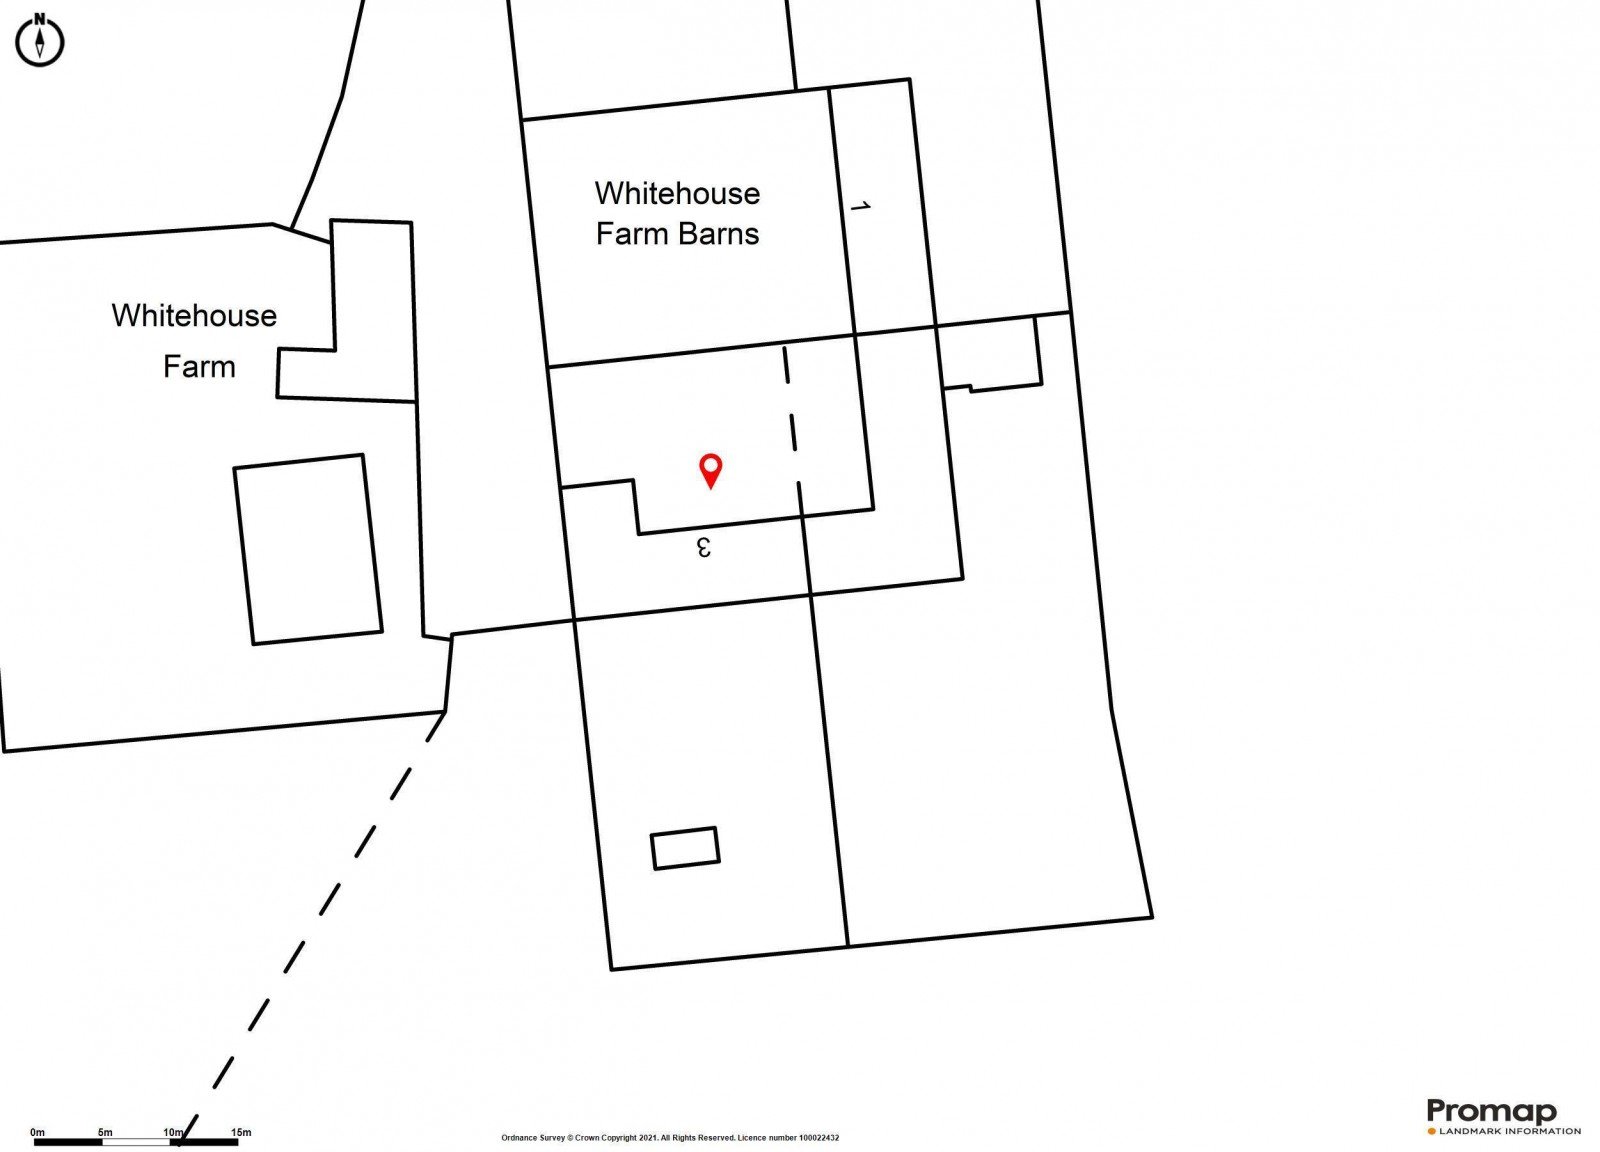 3 Whitehouse Farm Barns